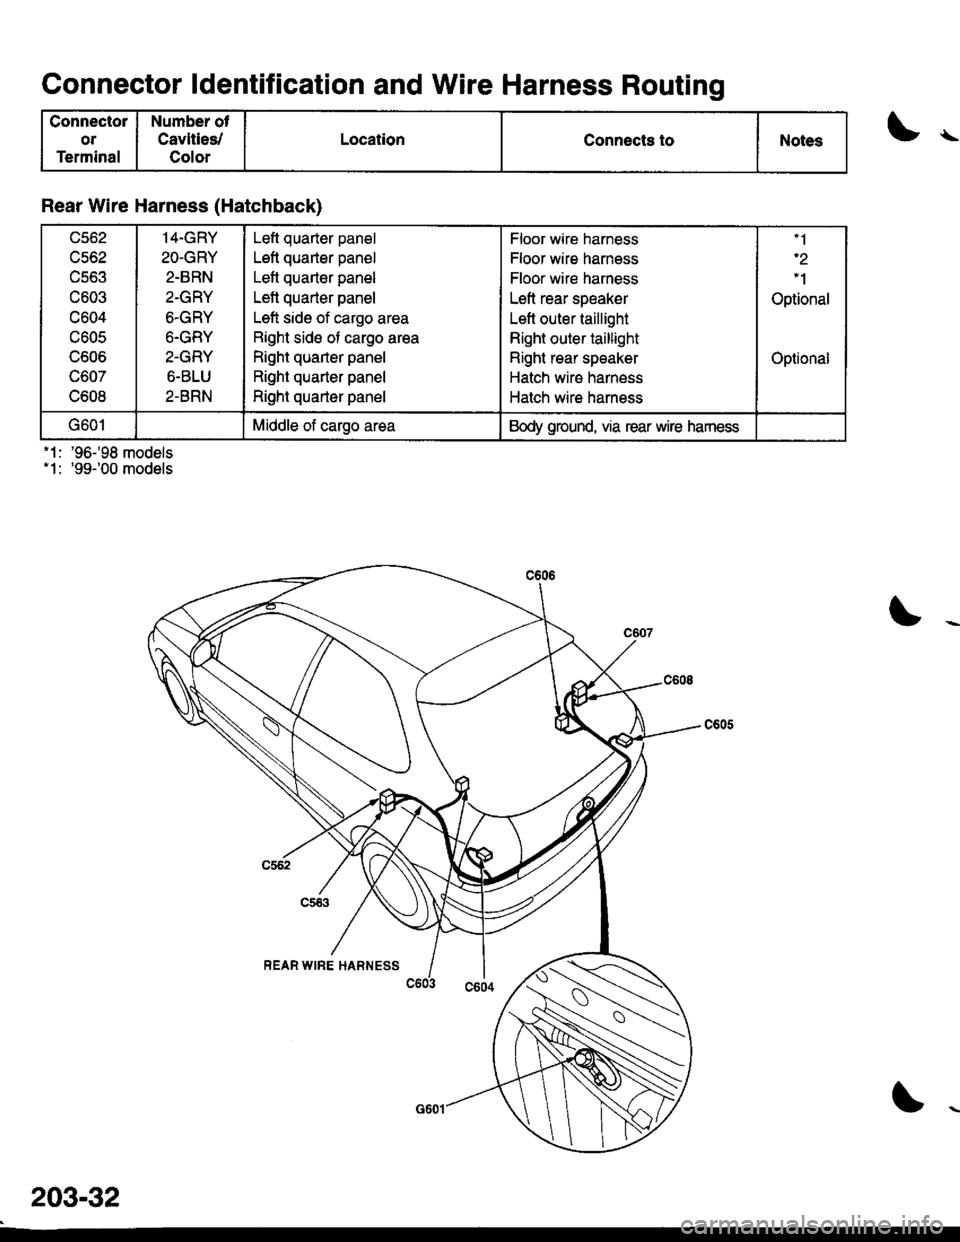 Honda Civic 1998 6g Workshop Manual 1996 Rear Lighting Wiring Diagram